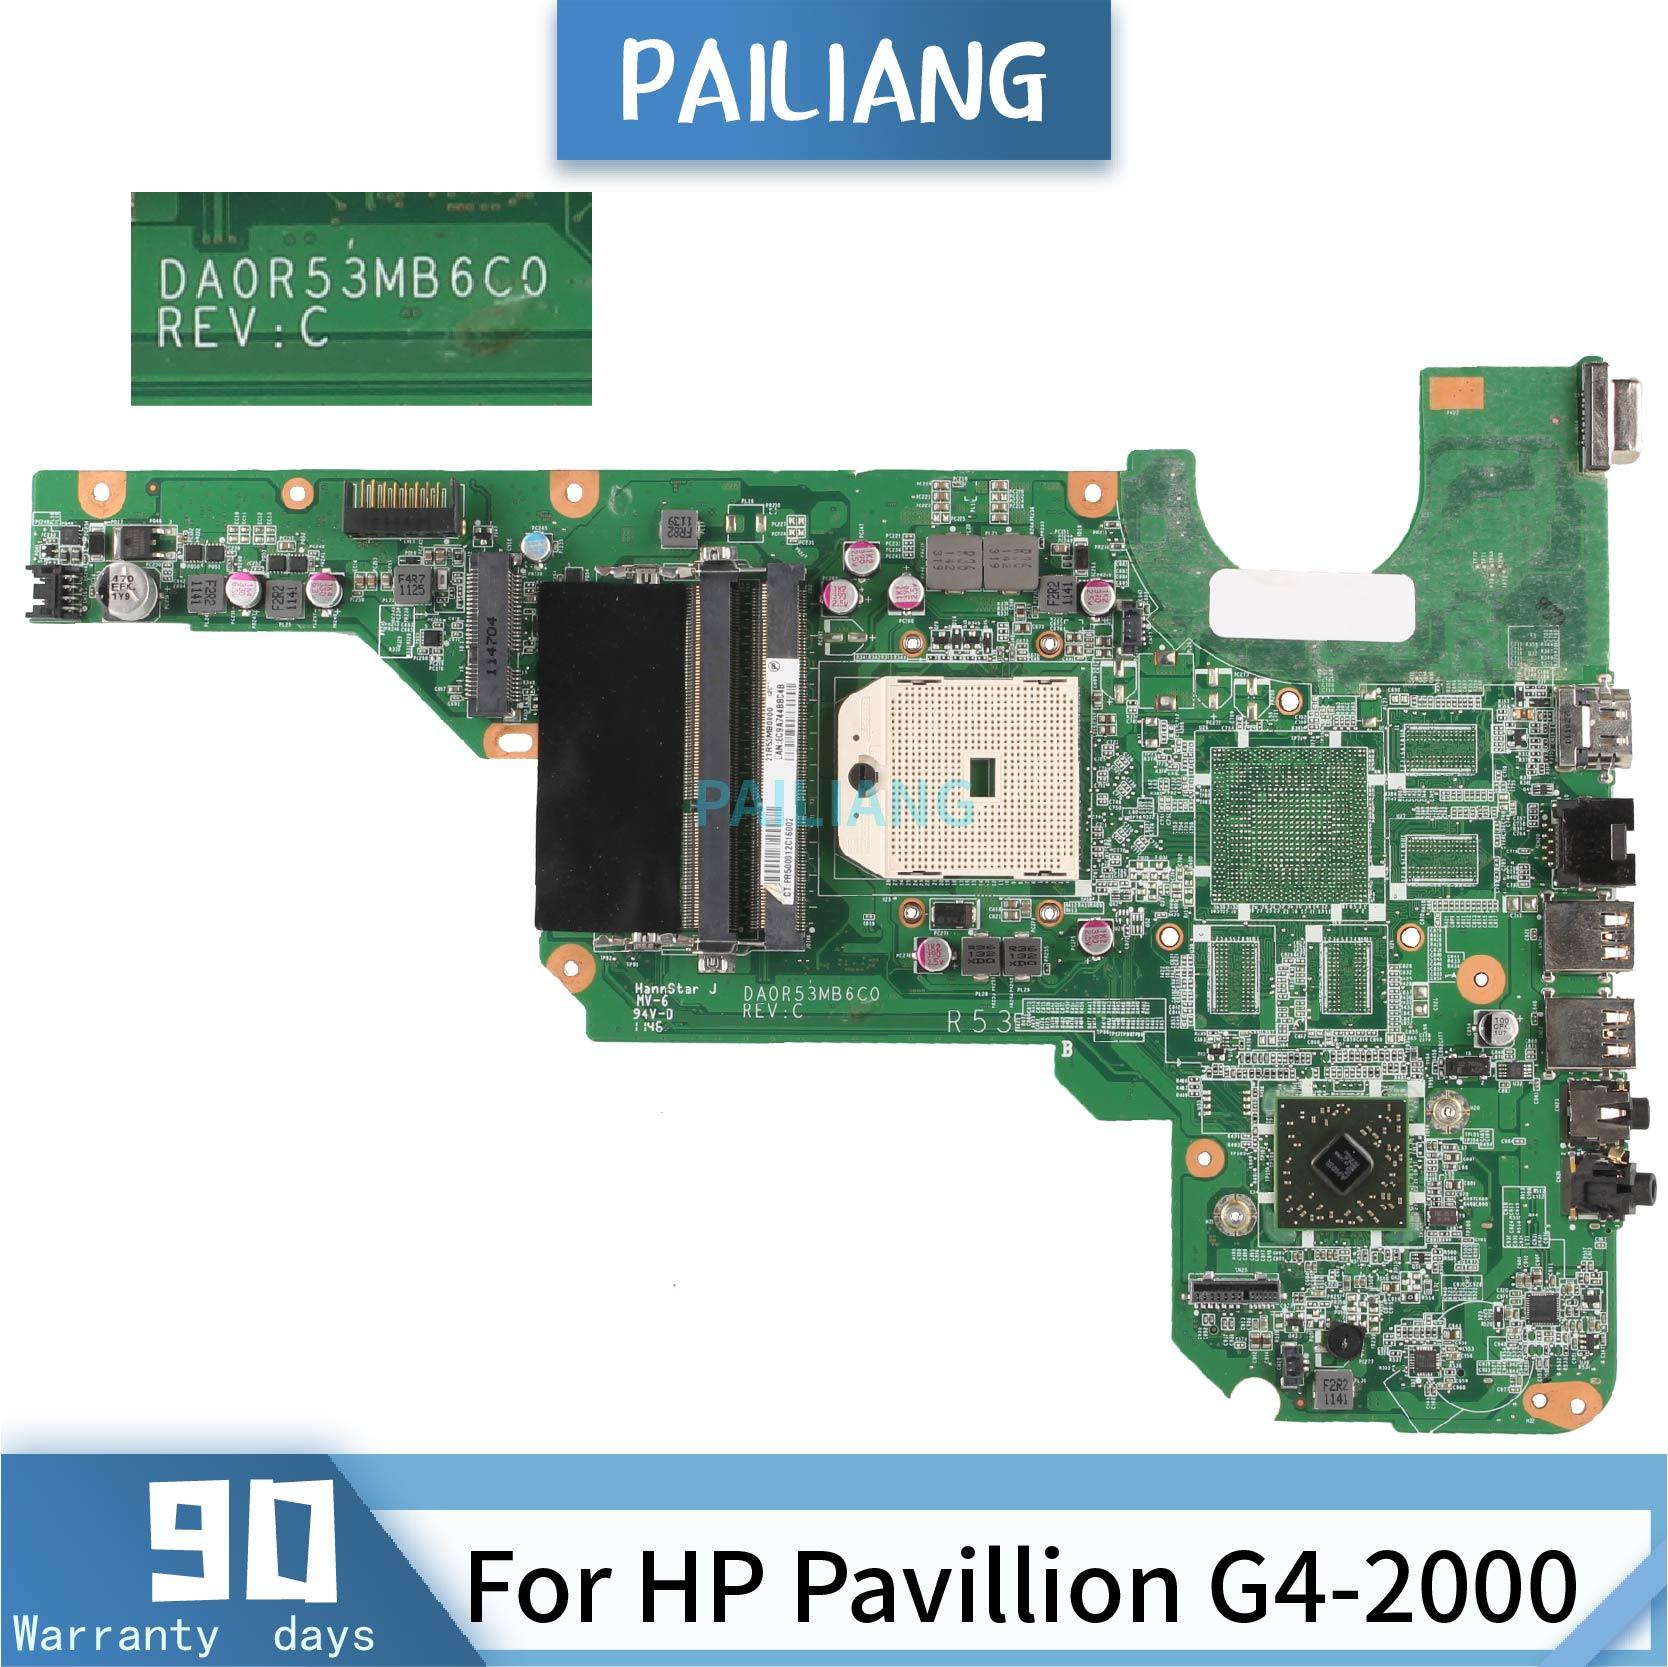 PAILIANG اللوحة لابتوب HP بافيليون G4-2000 DA0R53MB6C0 اللوحة DDR3 اختبار